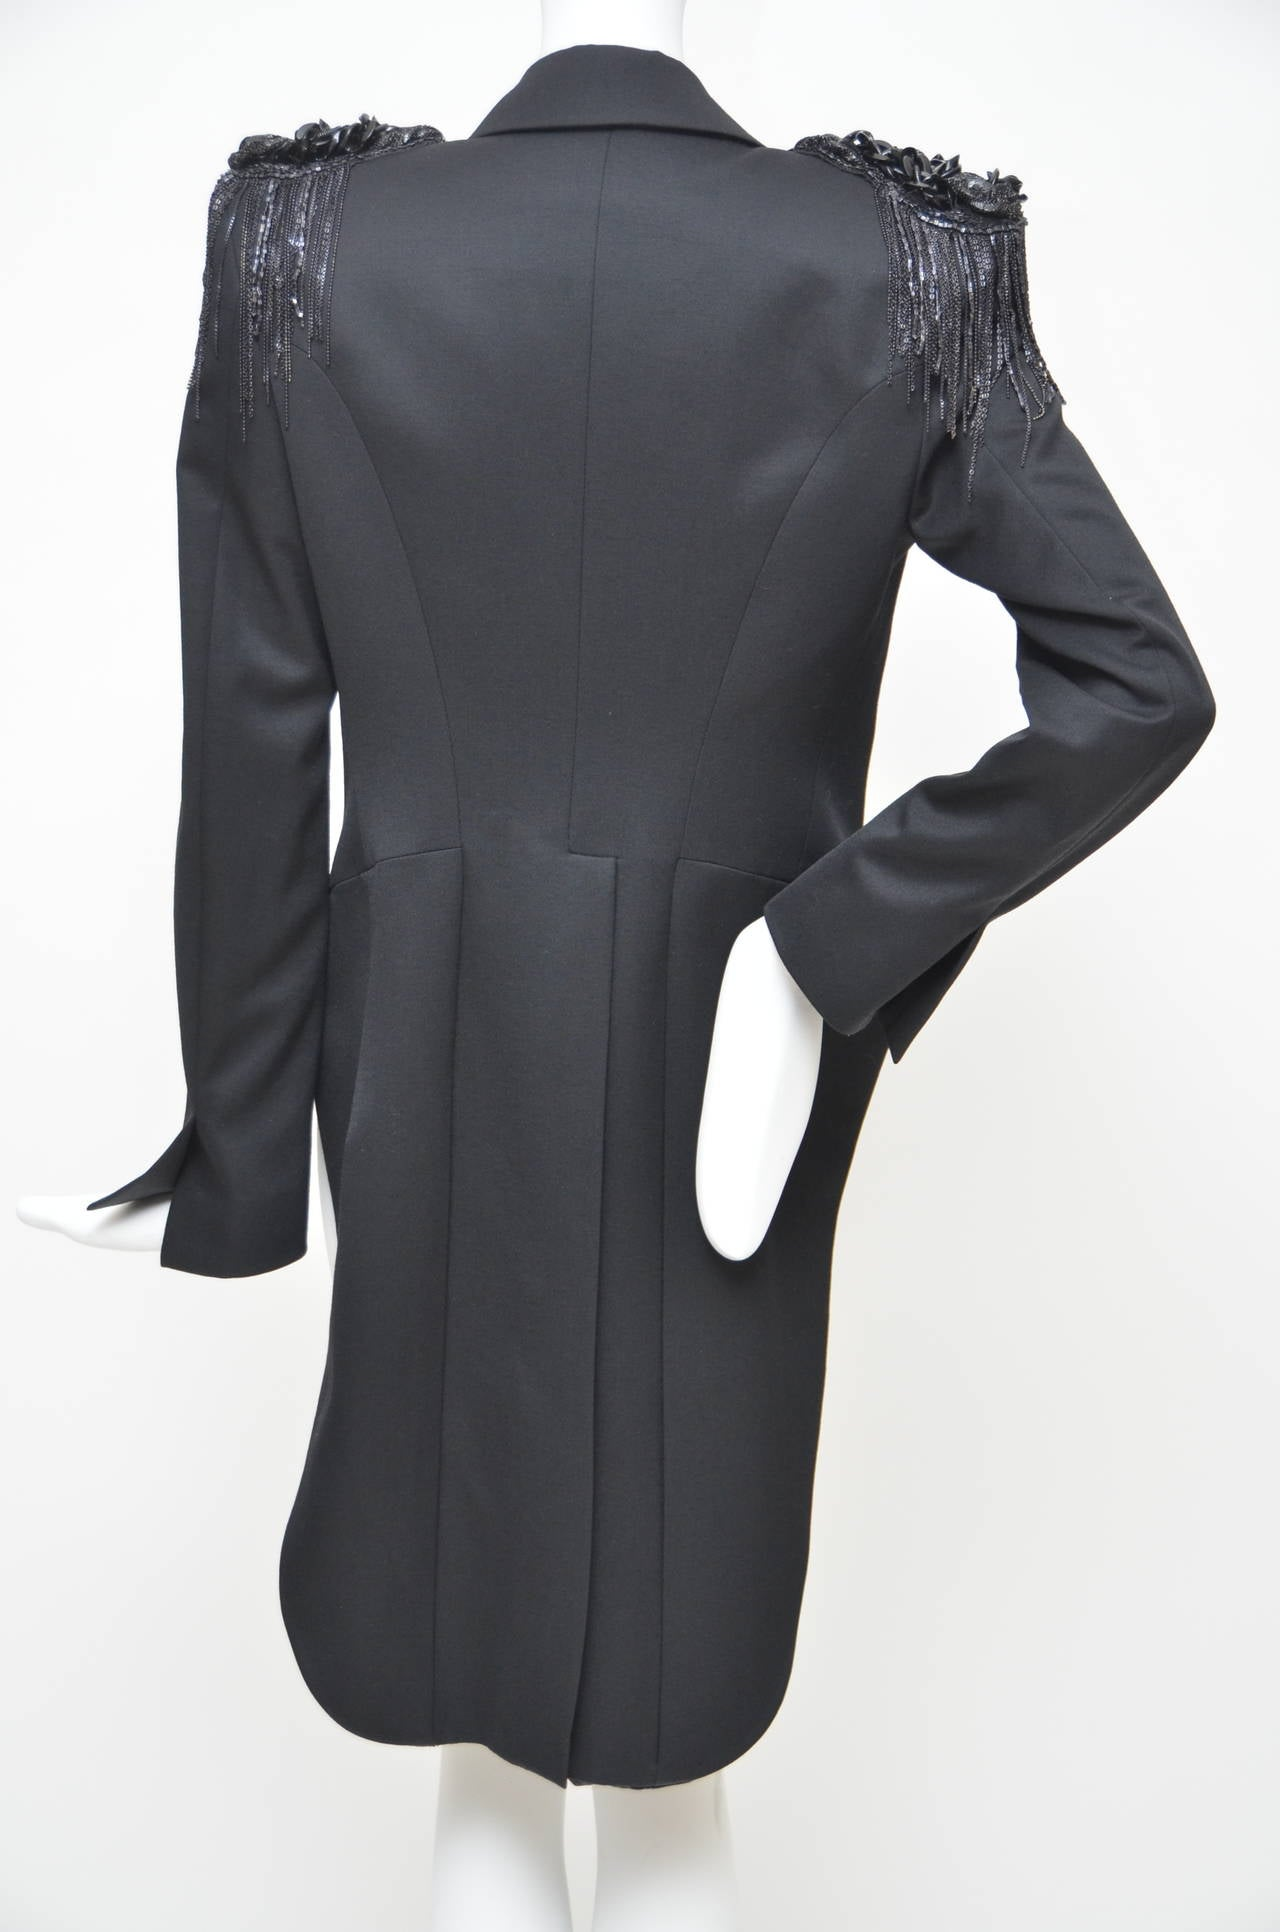 Balmain Runway Black Embroidered Detail Tail Coat Jacket